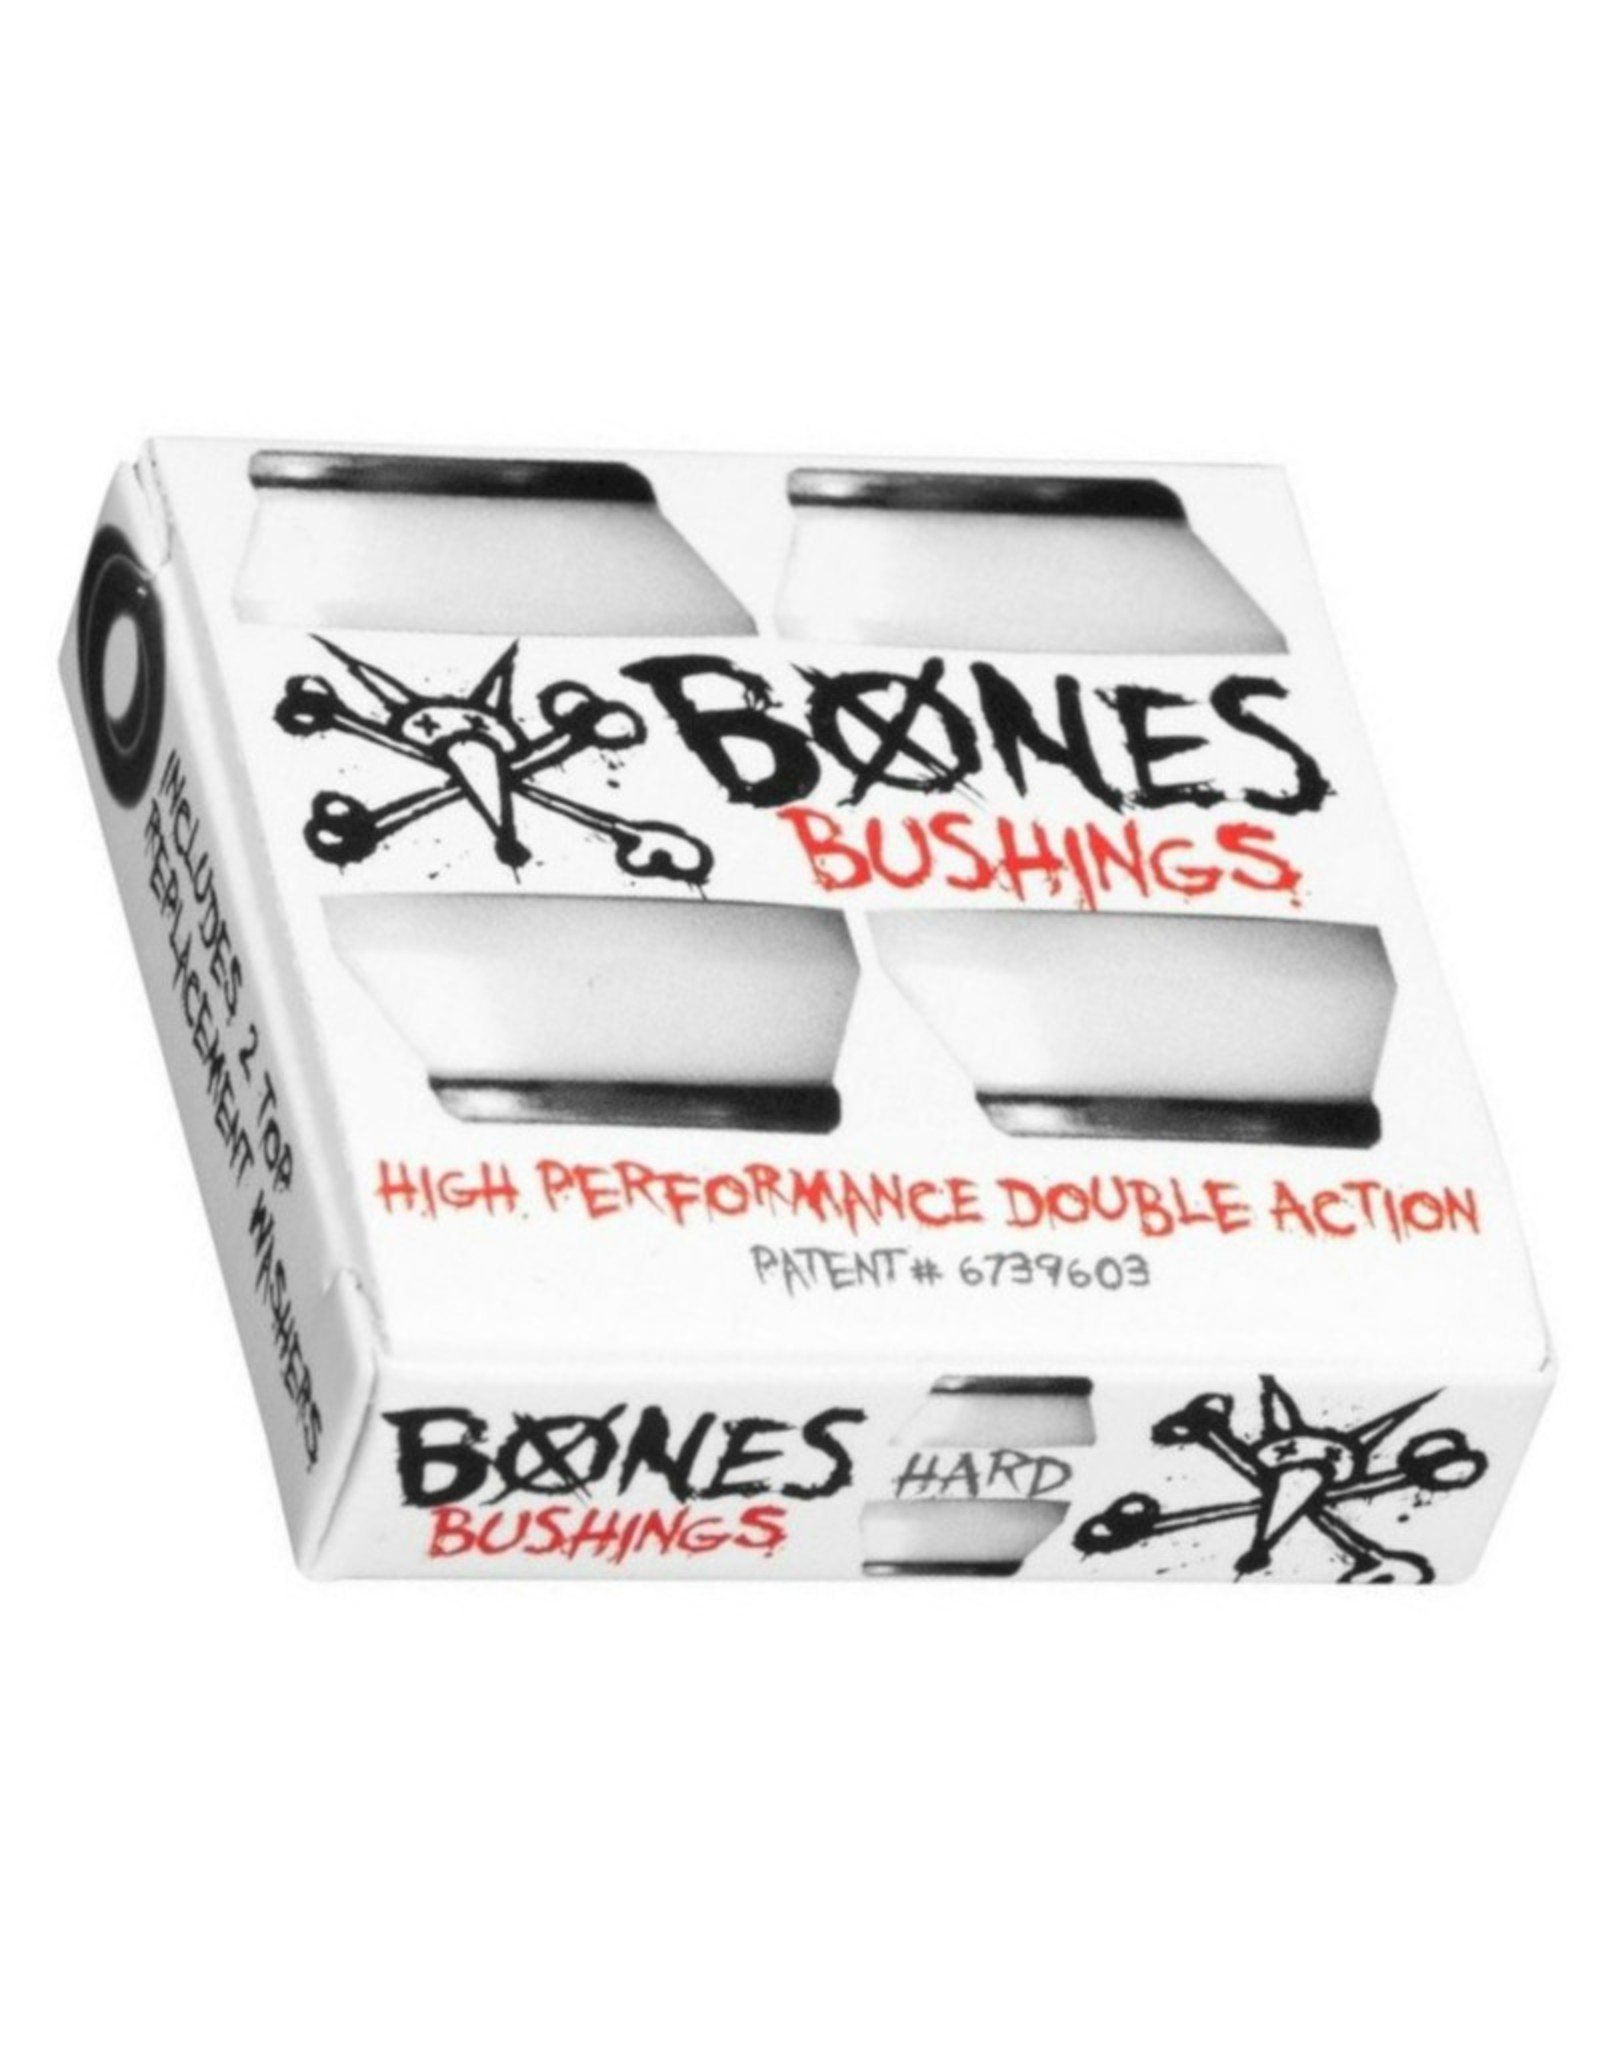 BONES BONES TRUCK BUSHINGS - White Or Black - Hard Medium & Soft